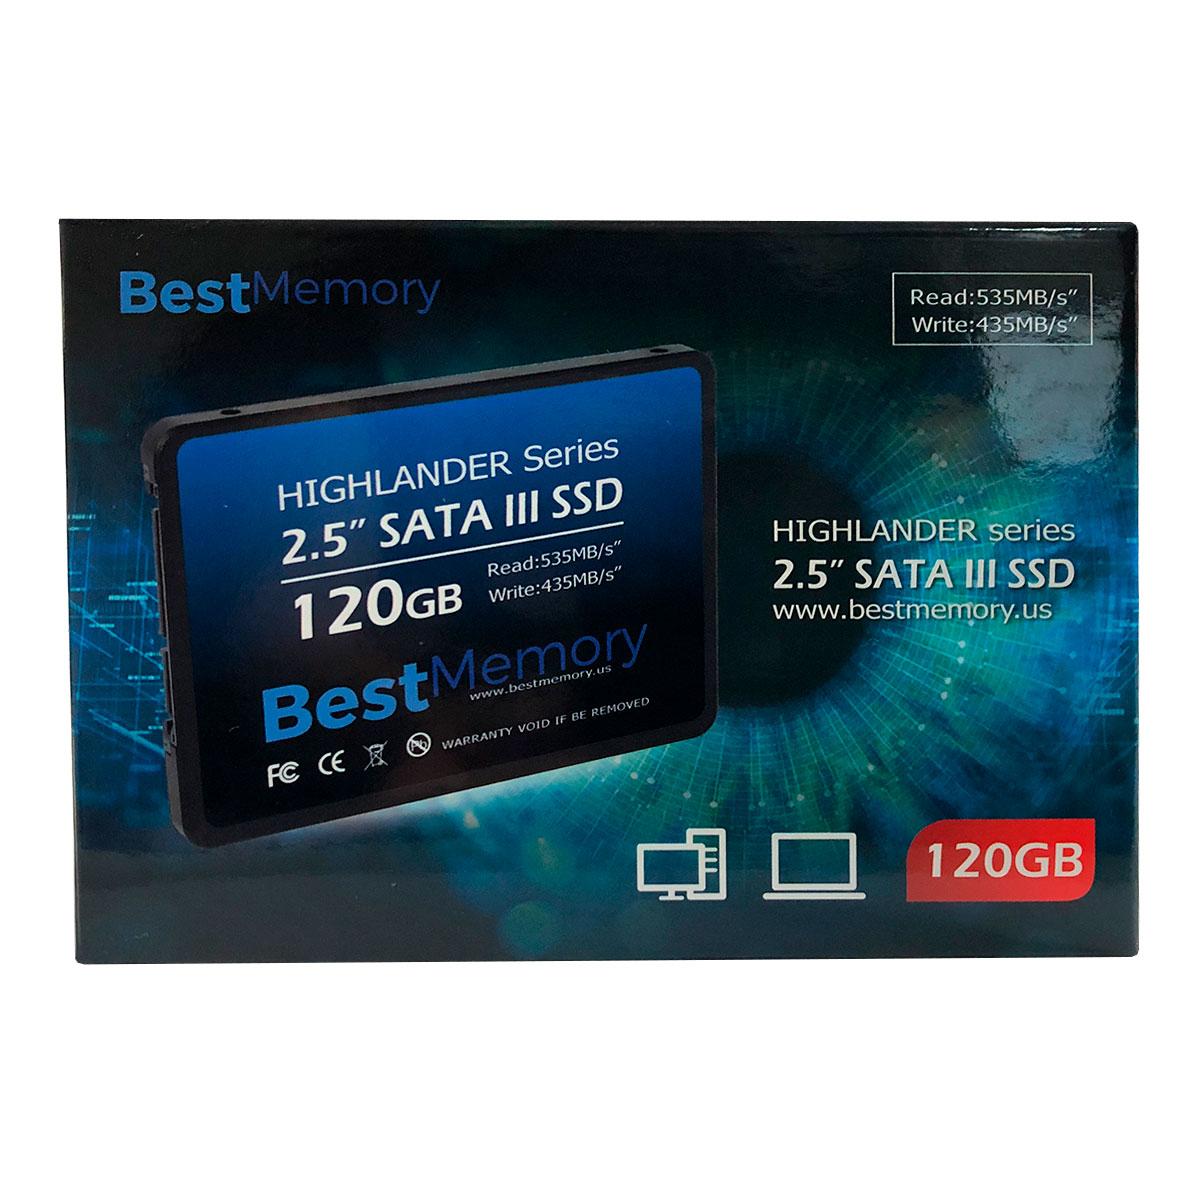 HD SSD Best Memory Highlander Series 120GB, Sata III 6Gb/s, 2.5 inch - BTSDA-120G-535